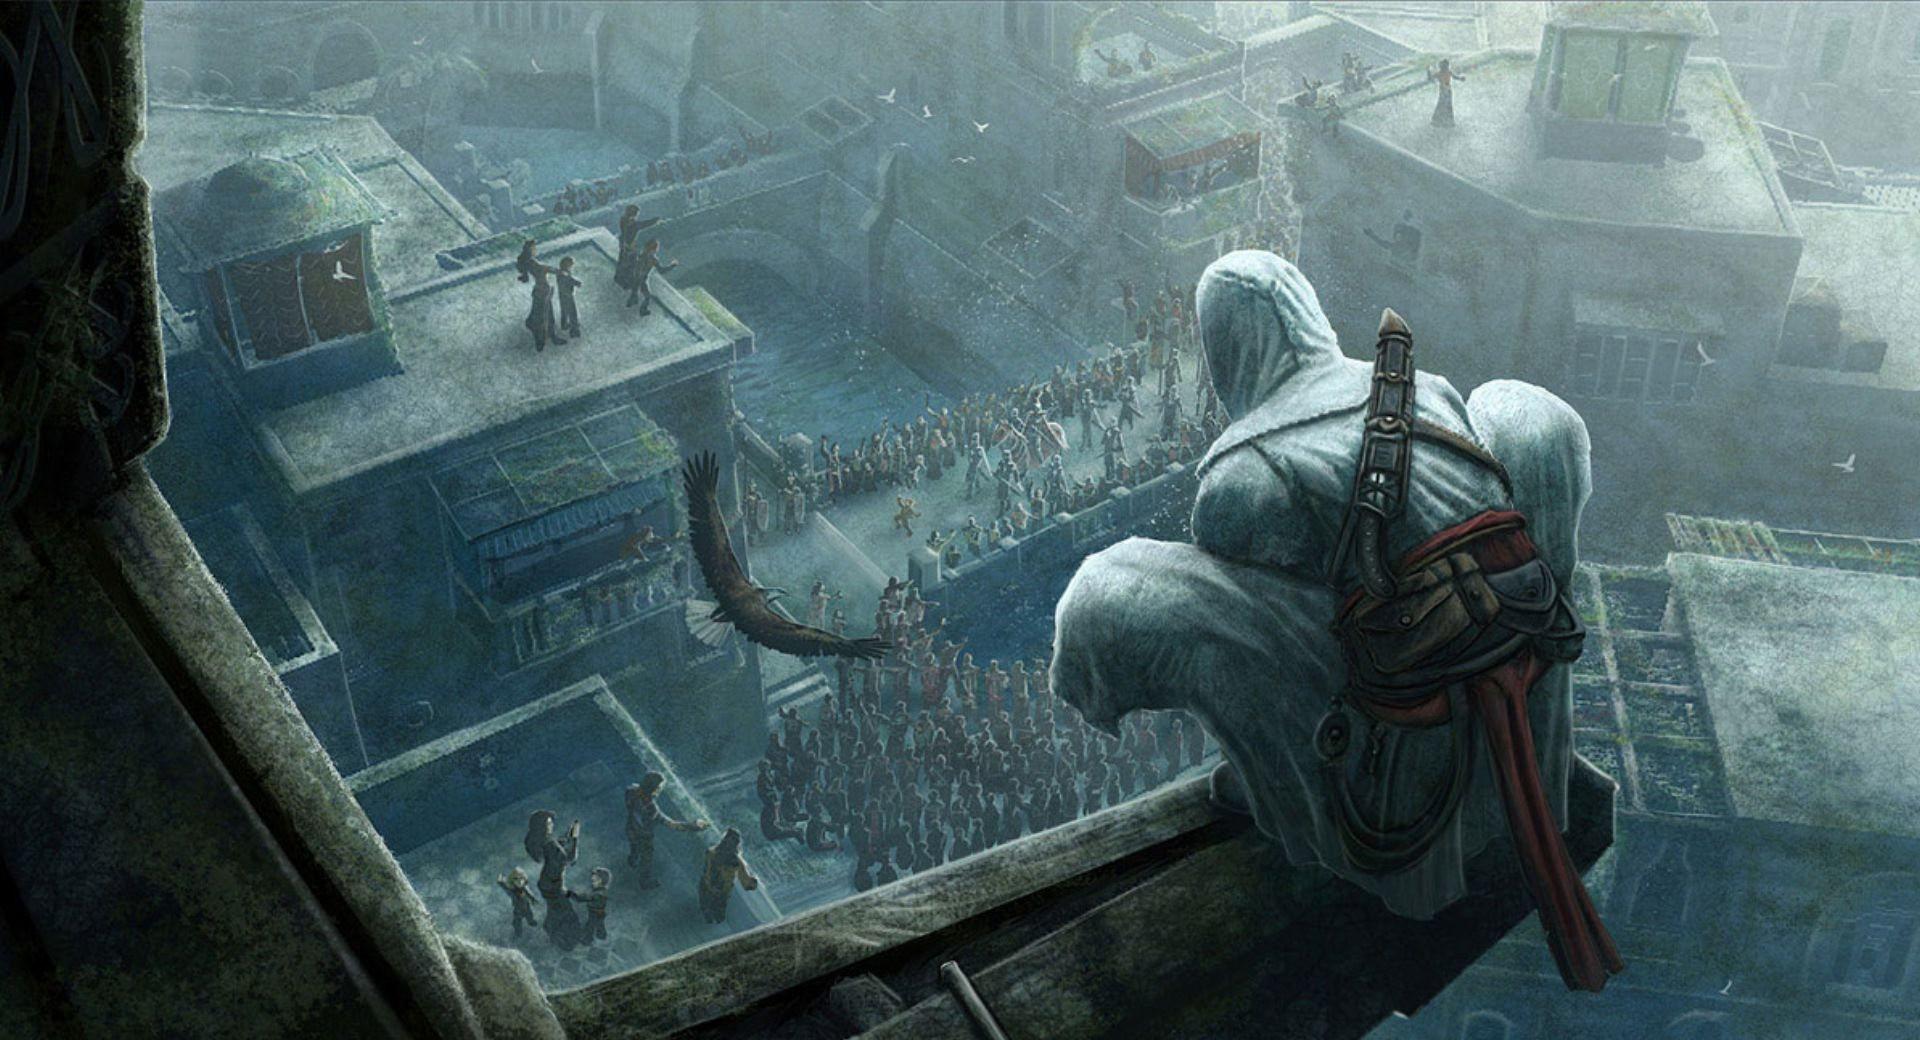 Art - Assassin's Creed Арт